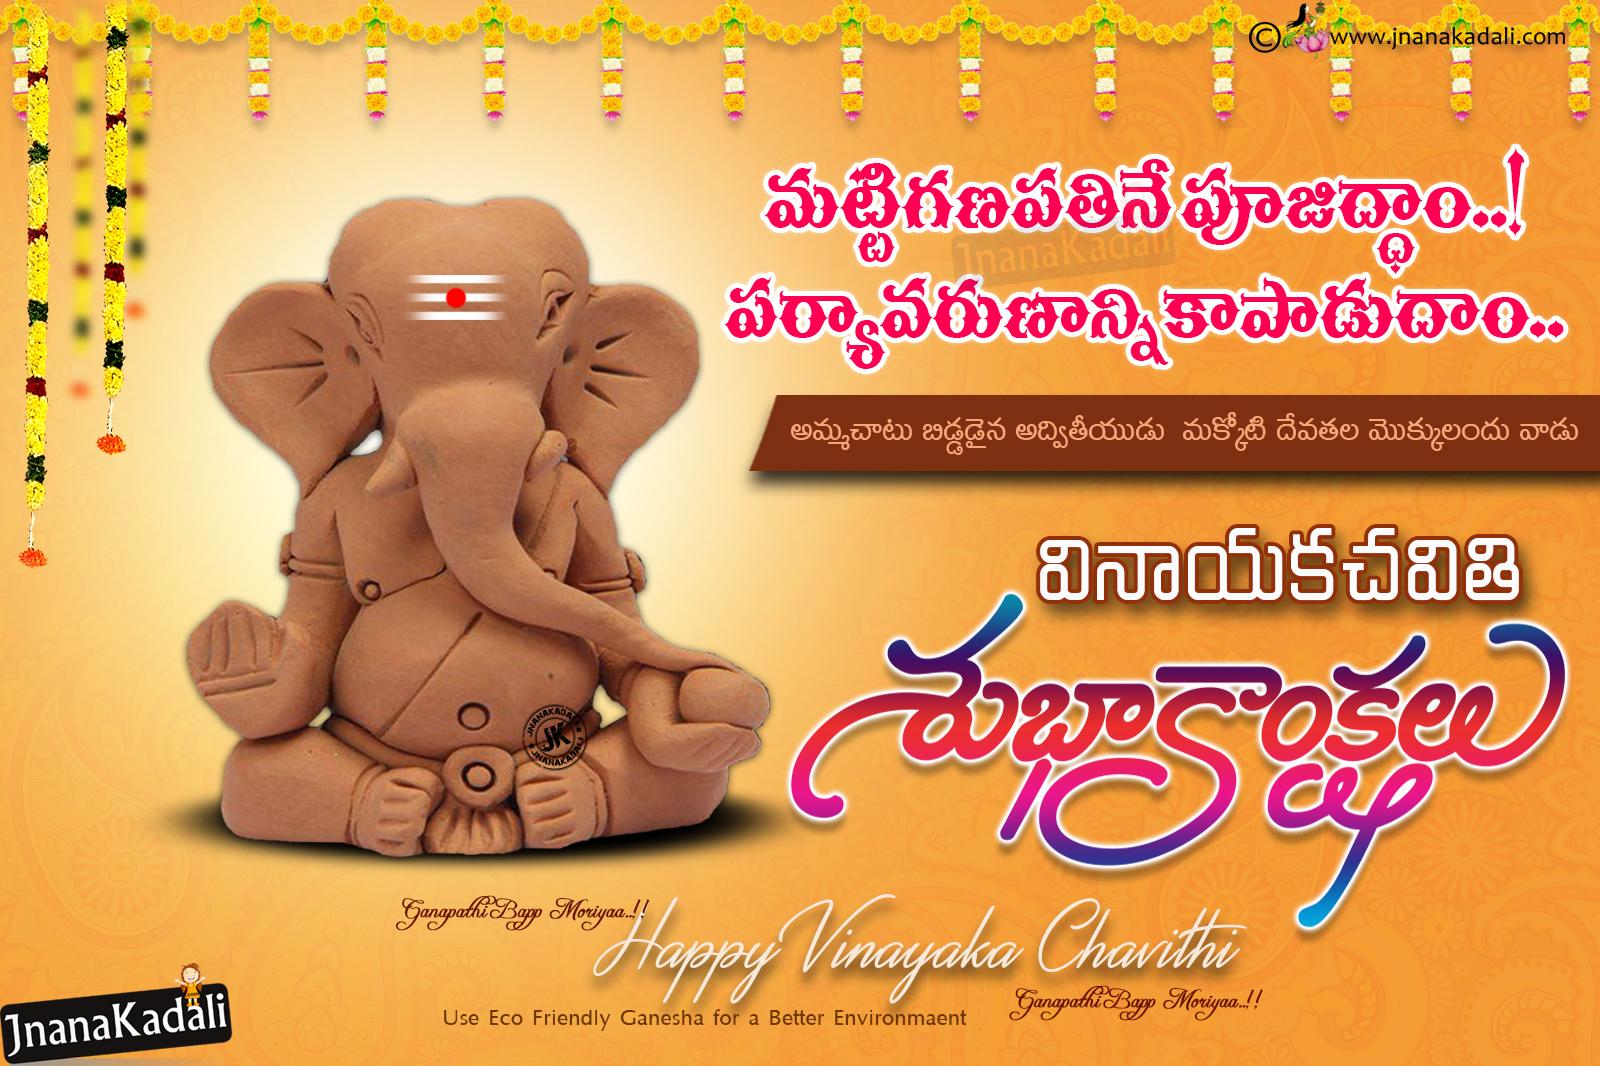 Ganesh Chaturthi Greetings in Telugu-Use Eco Friendly ...